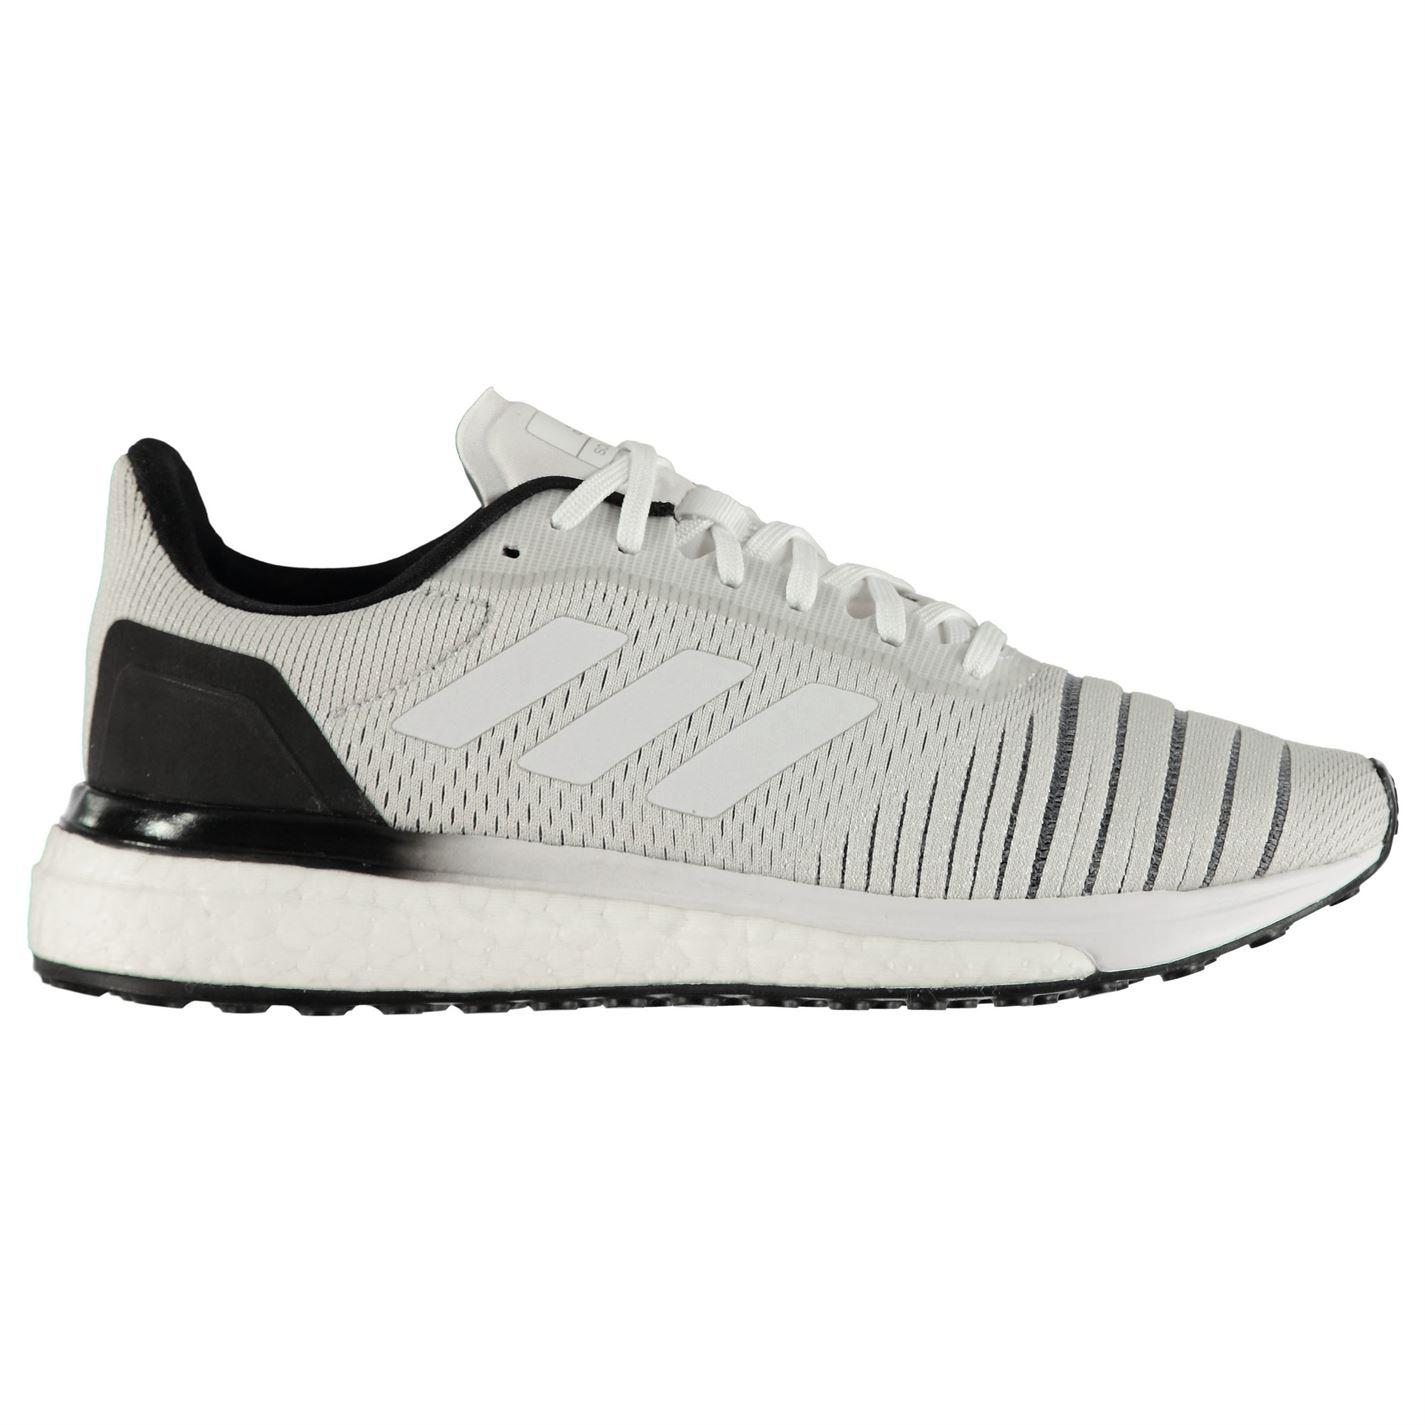 Adidas SolarDrive dámske bežecké tenisky